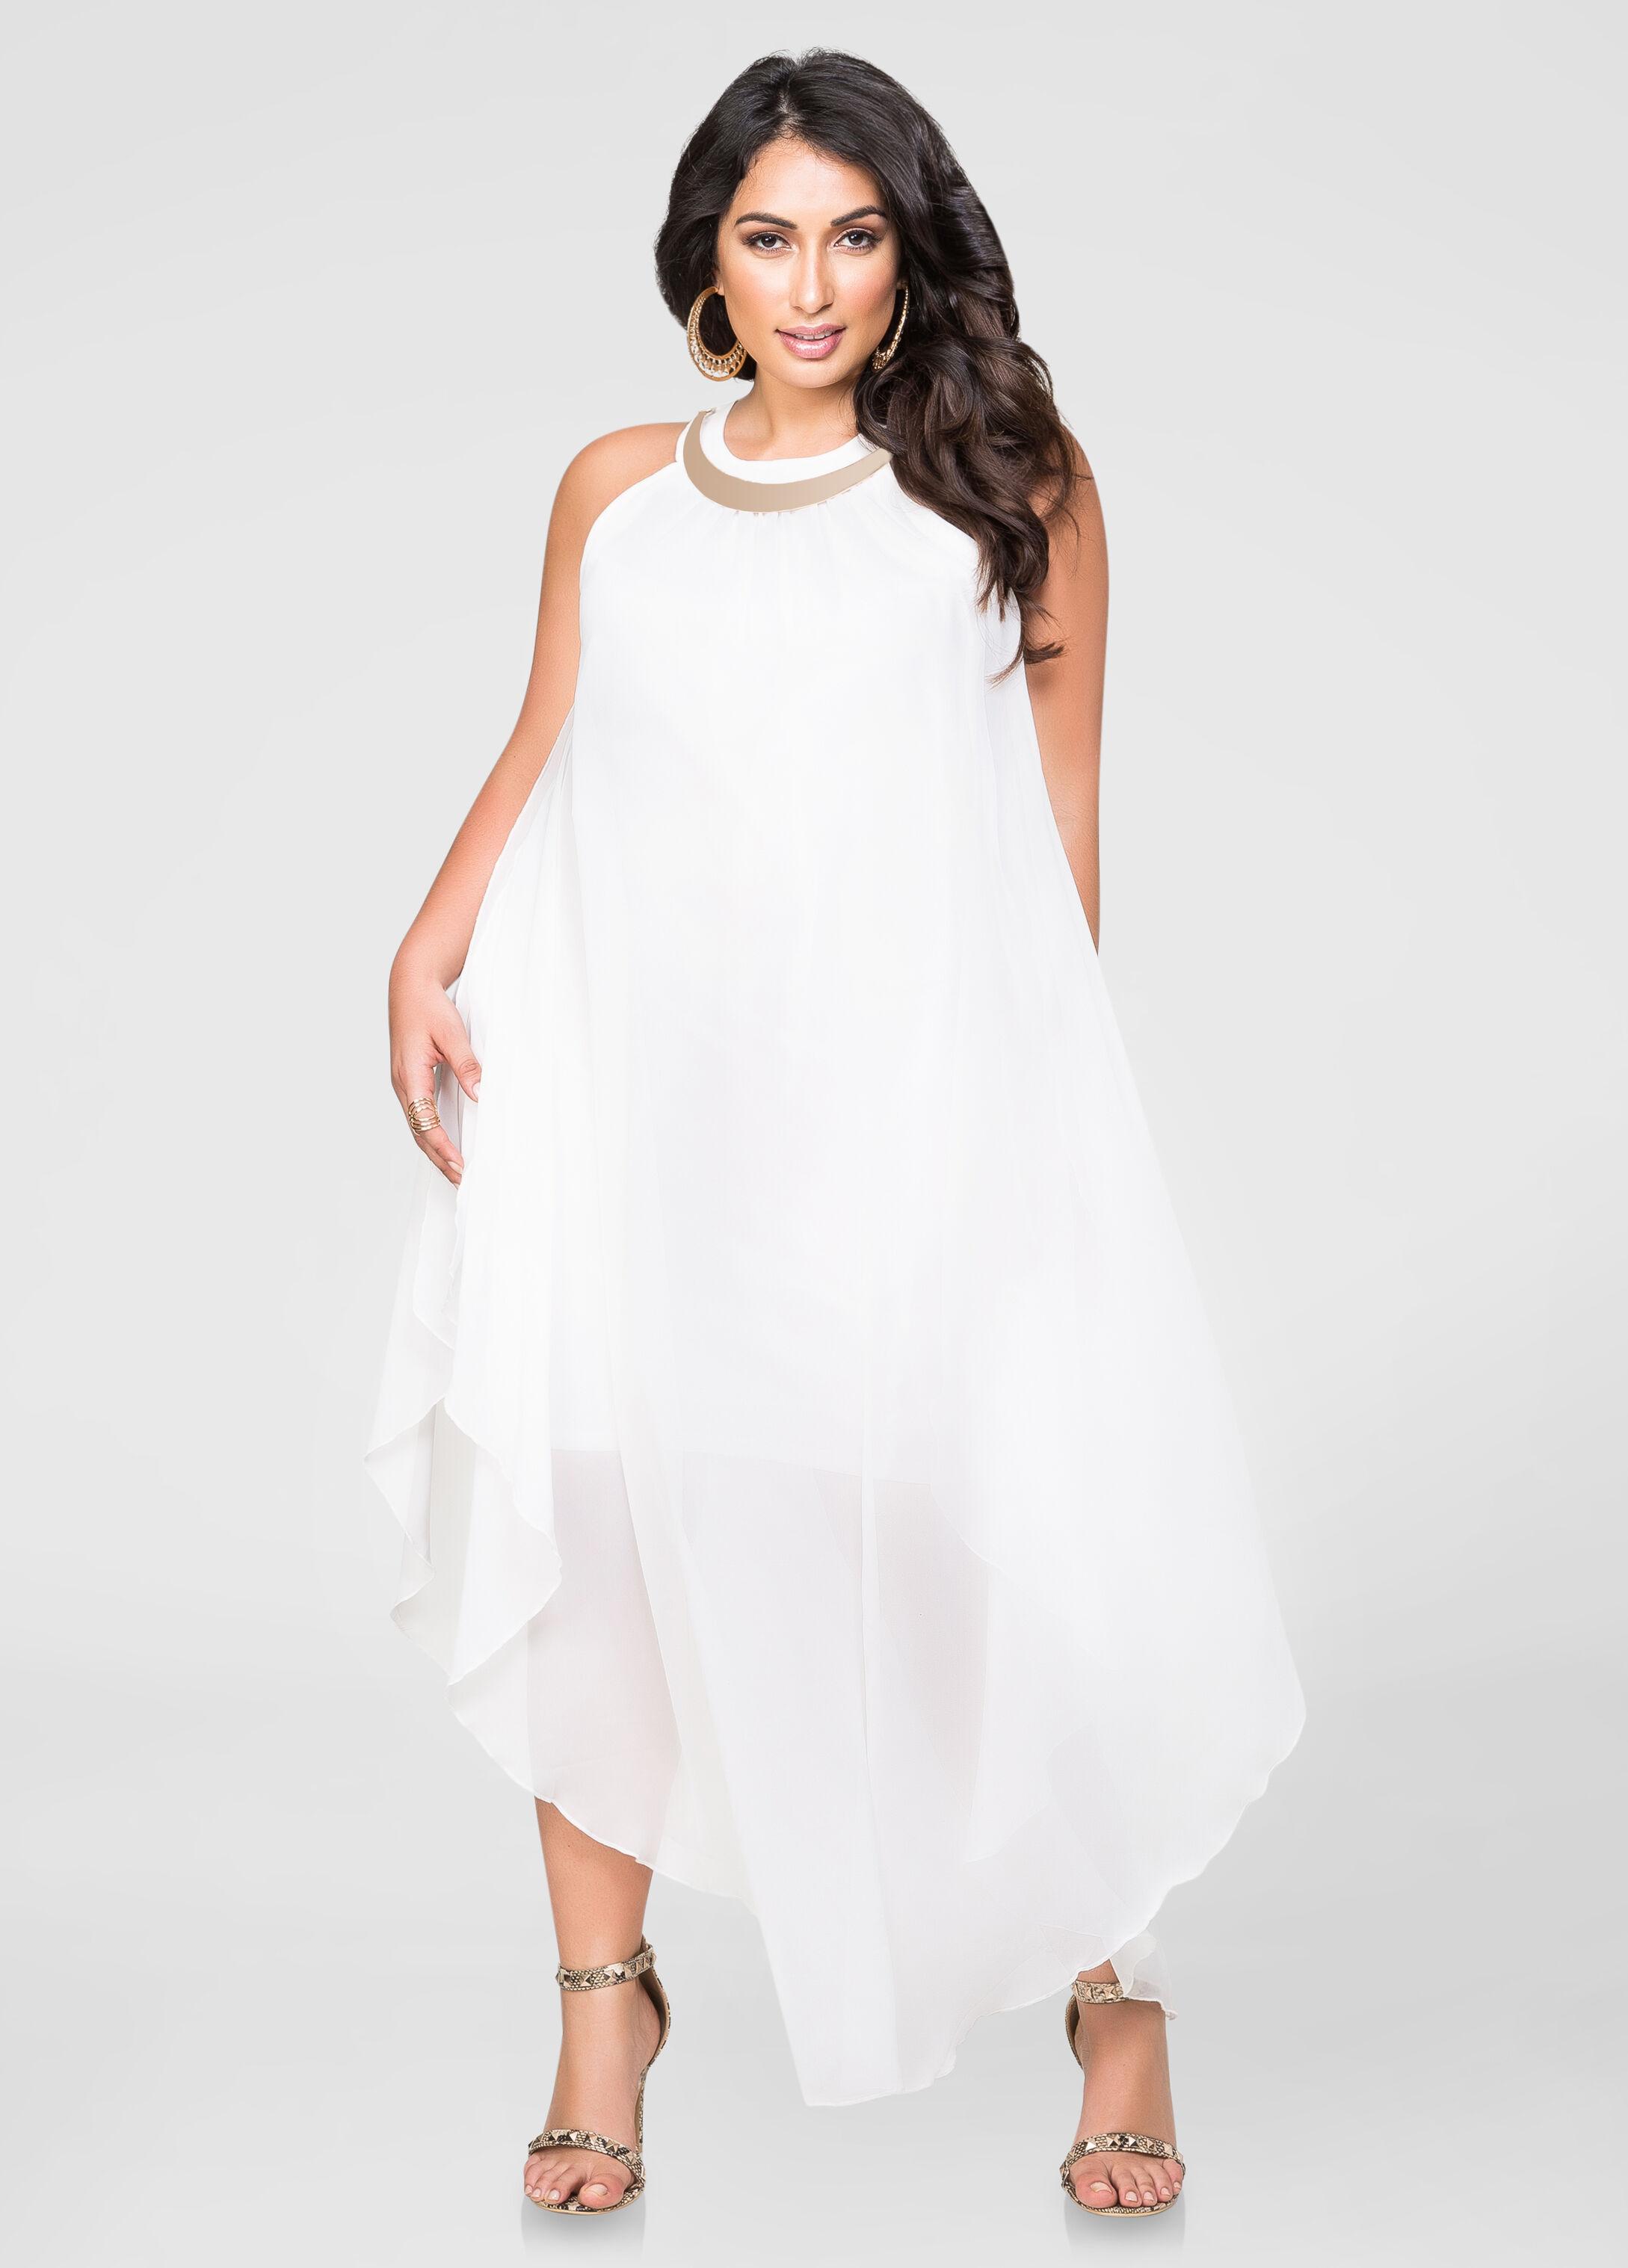 Goddess gold bar maxi dress plus size dresses ashley for Ashley stewart wedding dresses